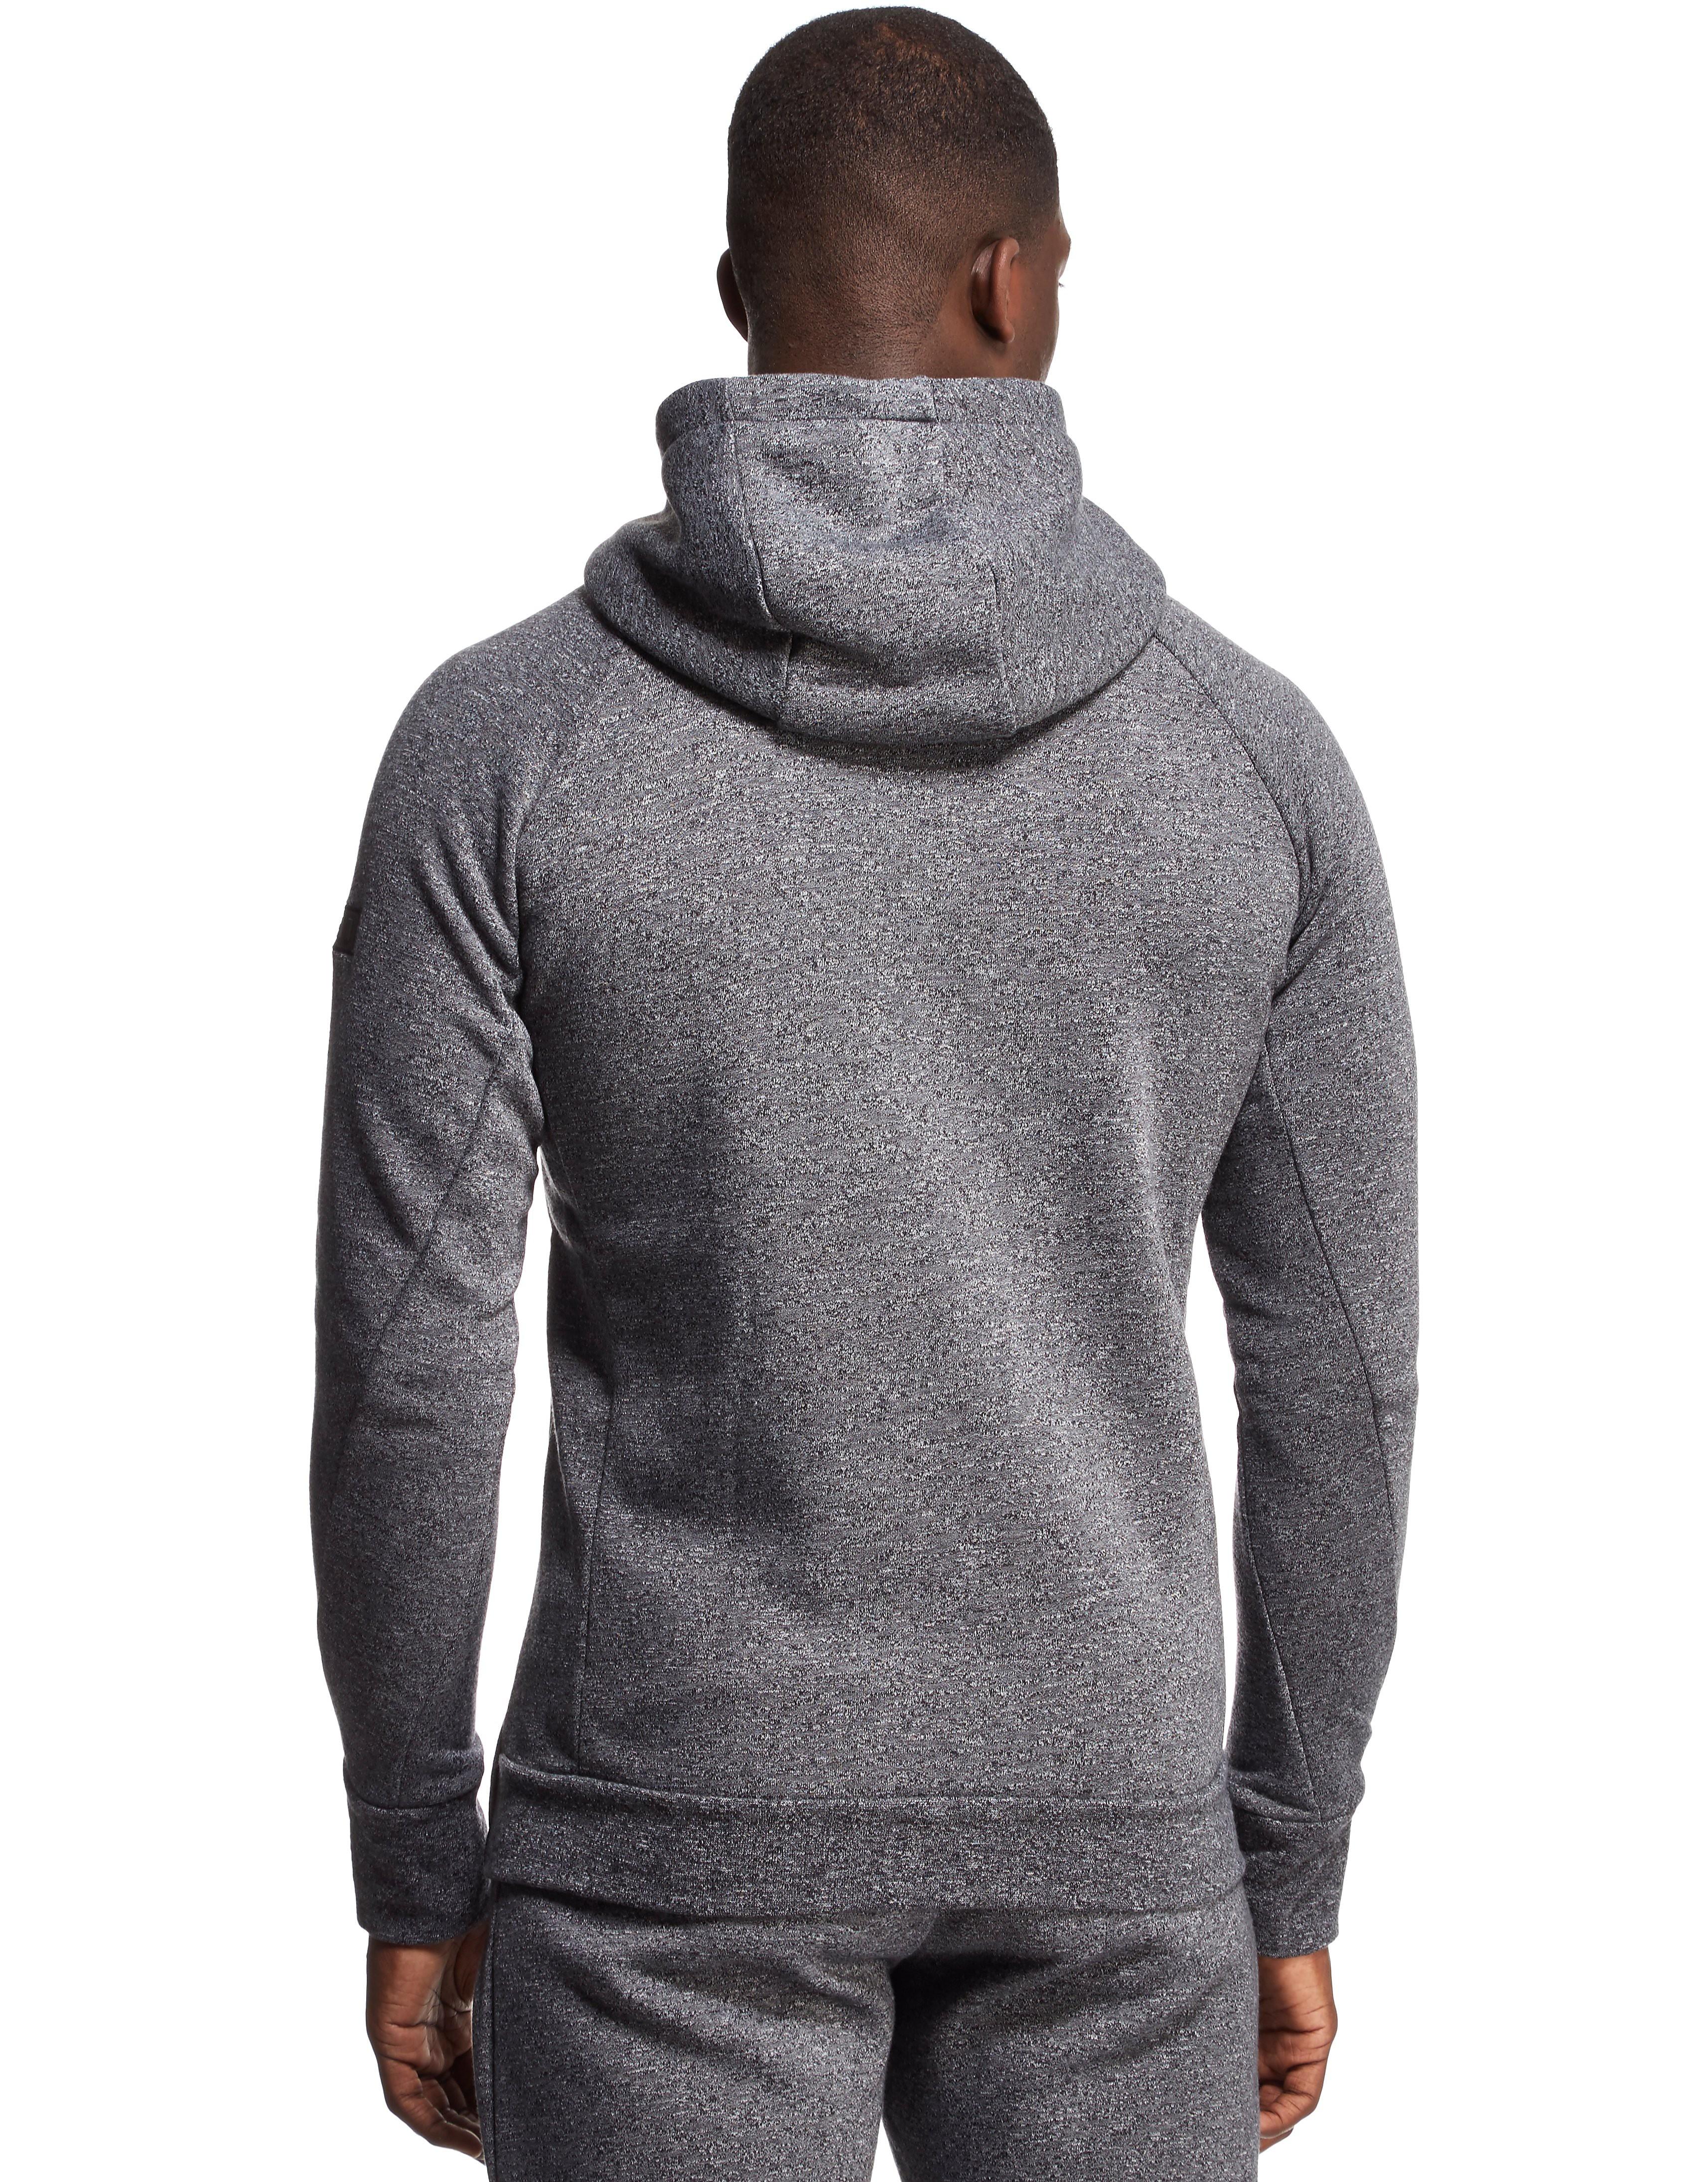 Jordan Icon Fleece Full Zip Hoody